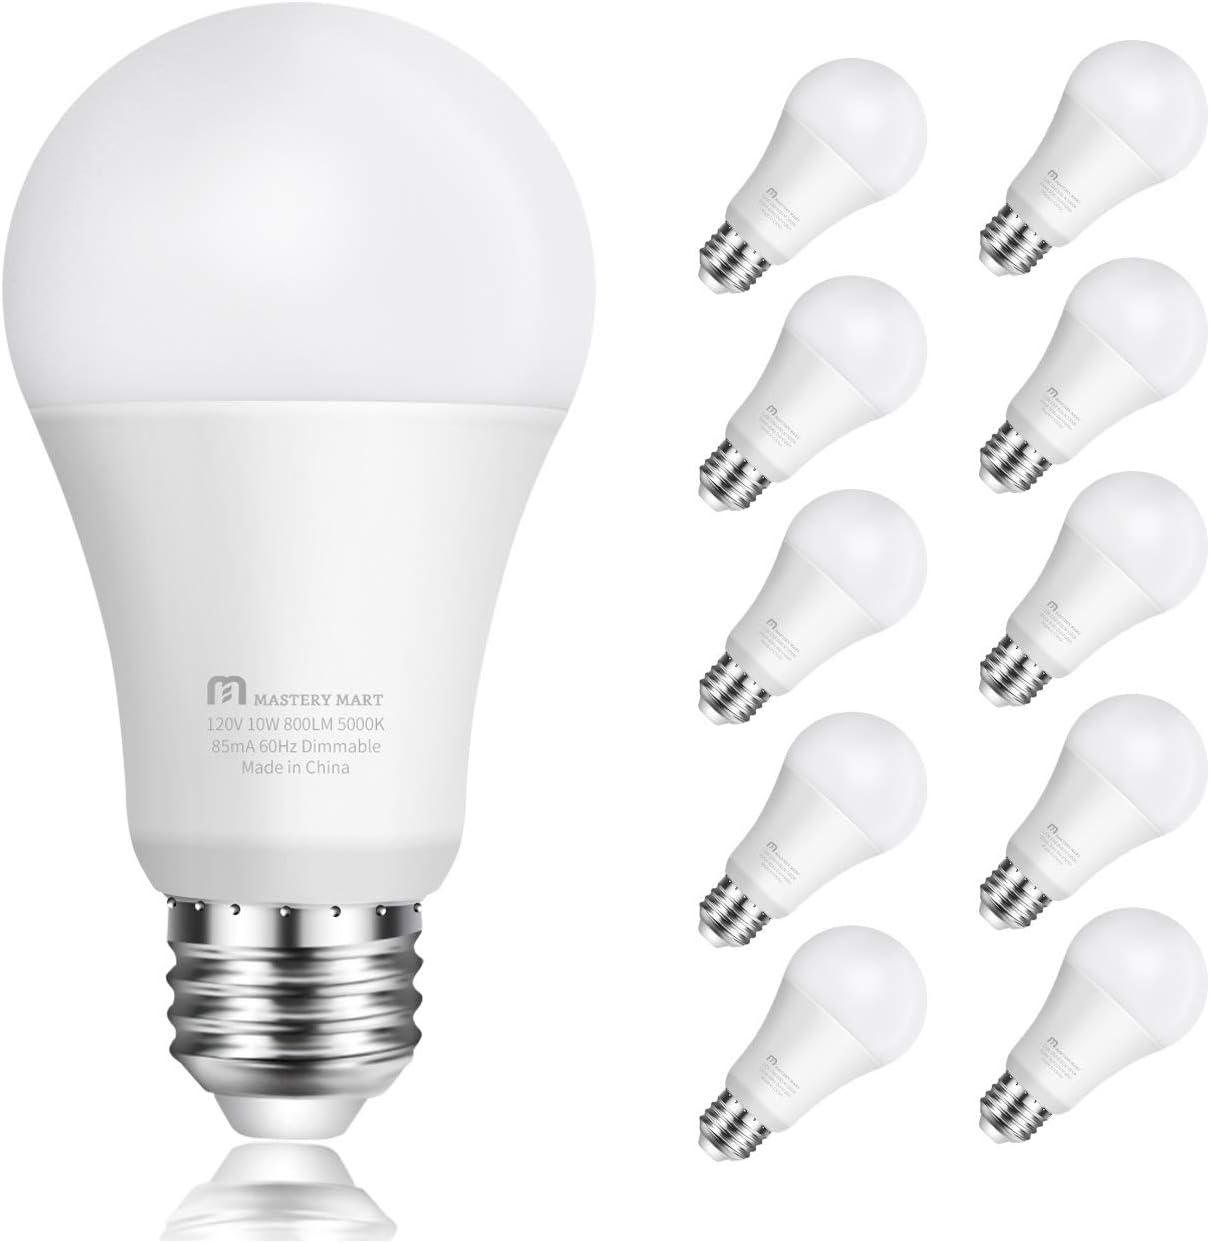 20 pack LED Light Bulbs New 60 Watt Equivalent A19 Dimmable Daylight 5000k Lot